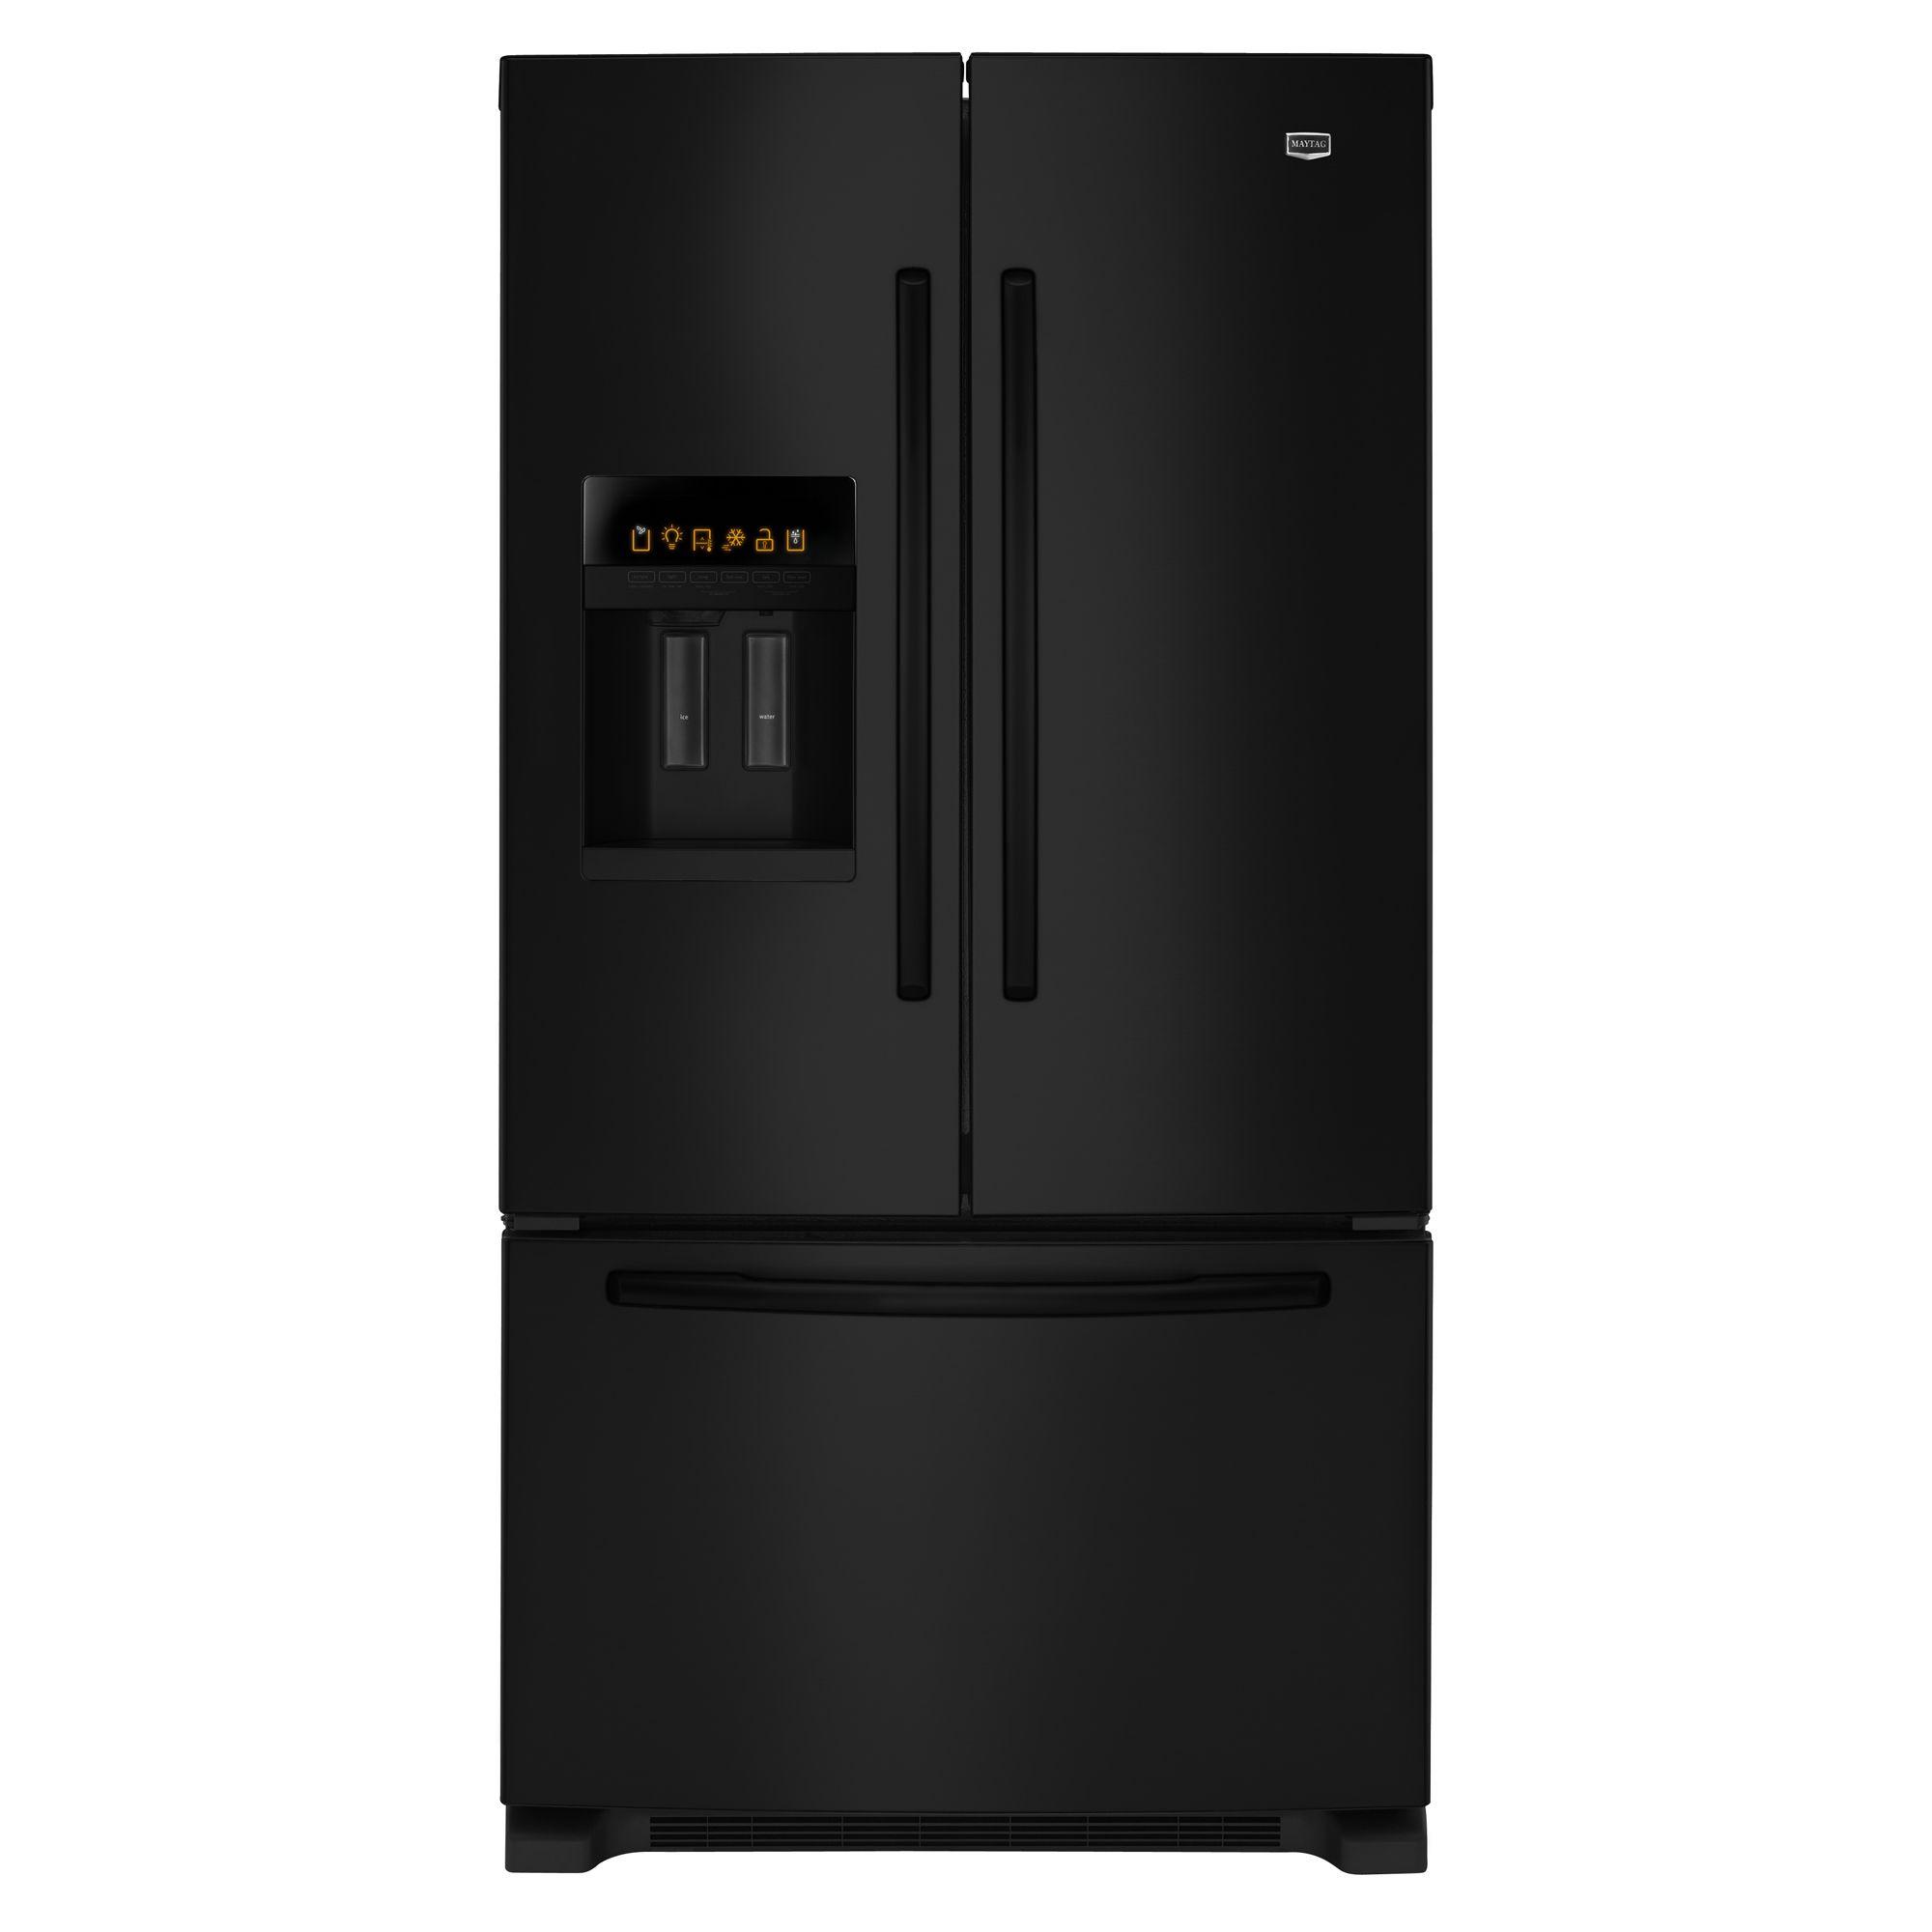 25.5 cu. ft. French Door Bottom Freezer Refrigerator w/ Dispenser